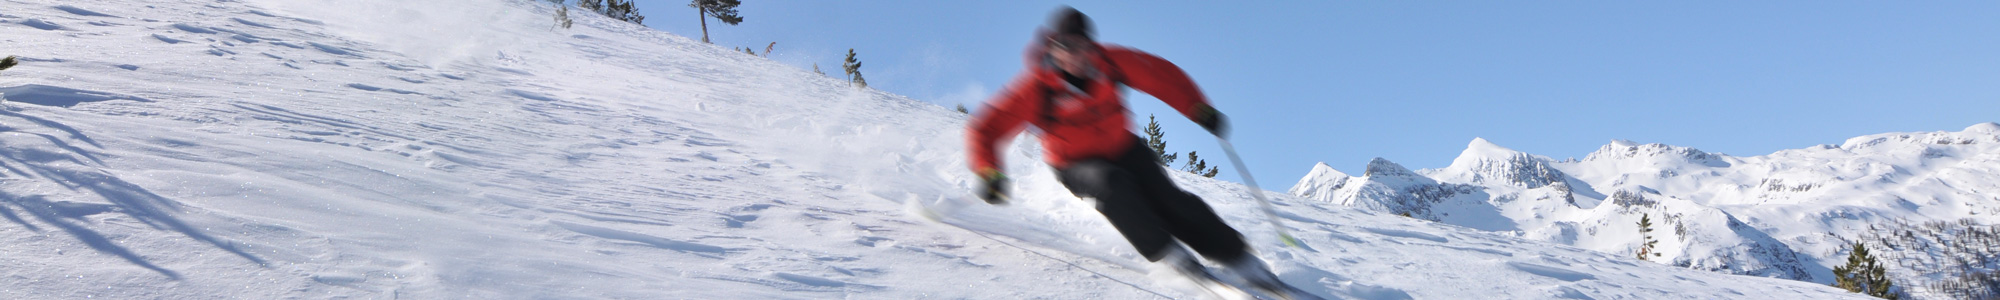 slide-ski-04